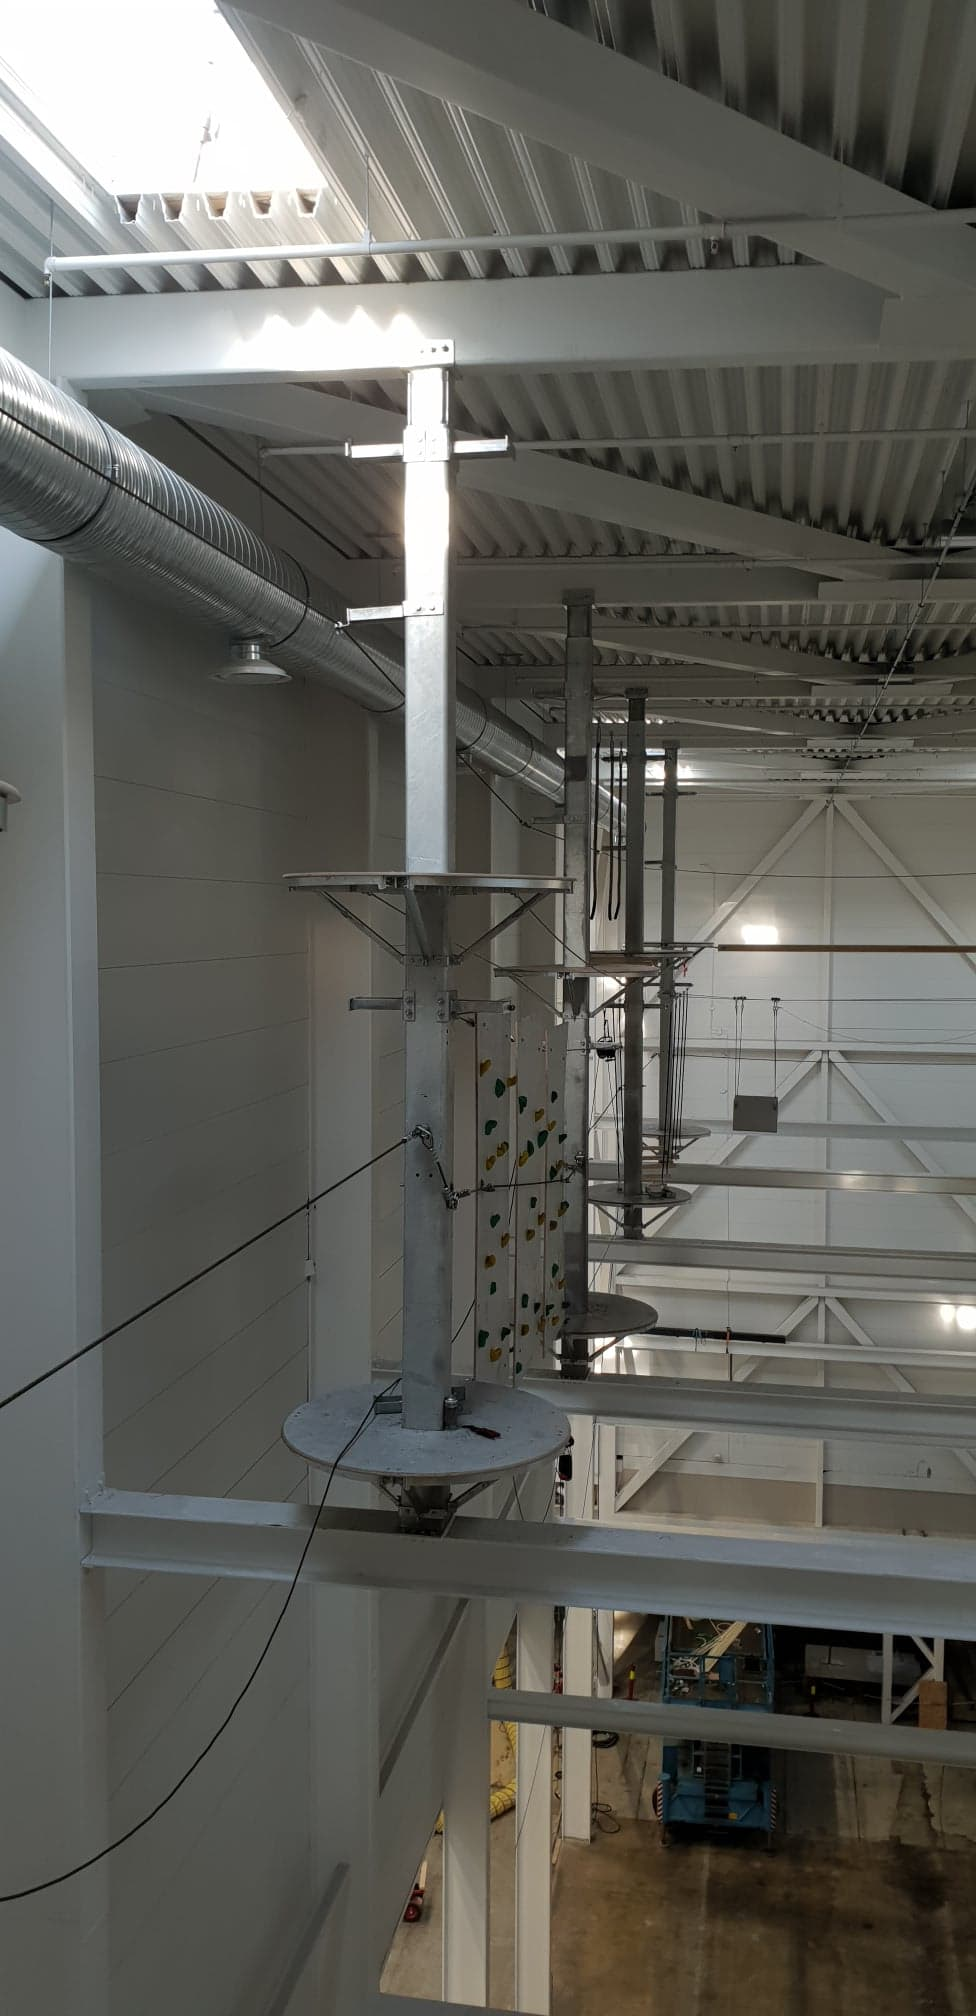 High rope bane, Unisport